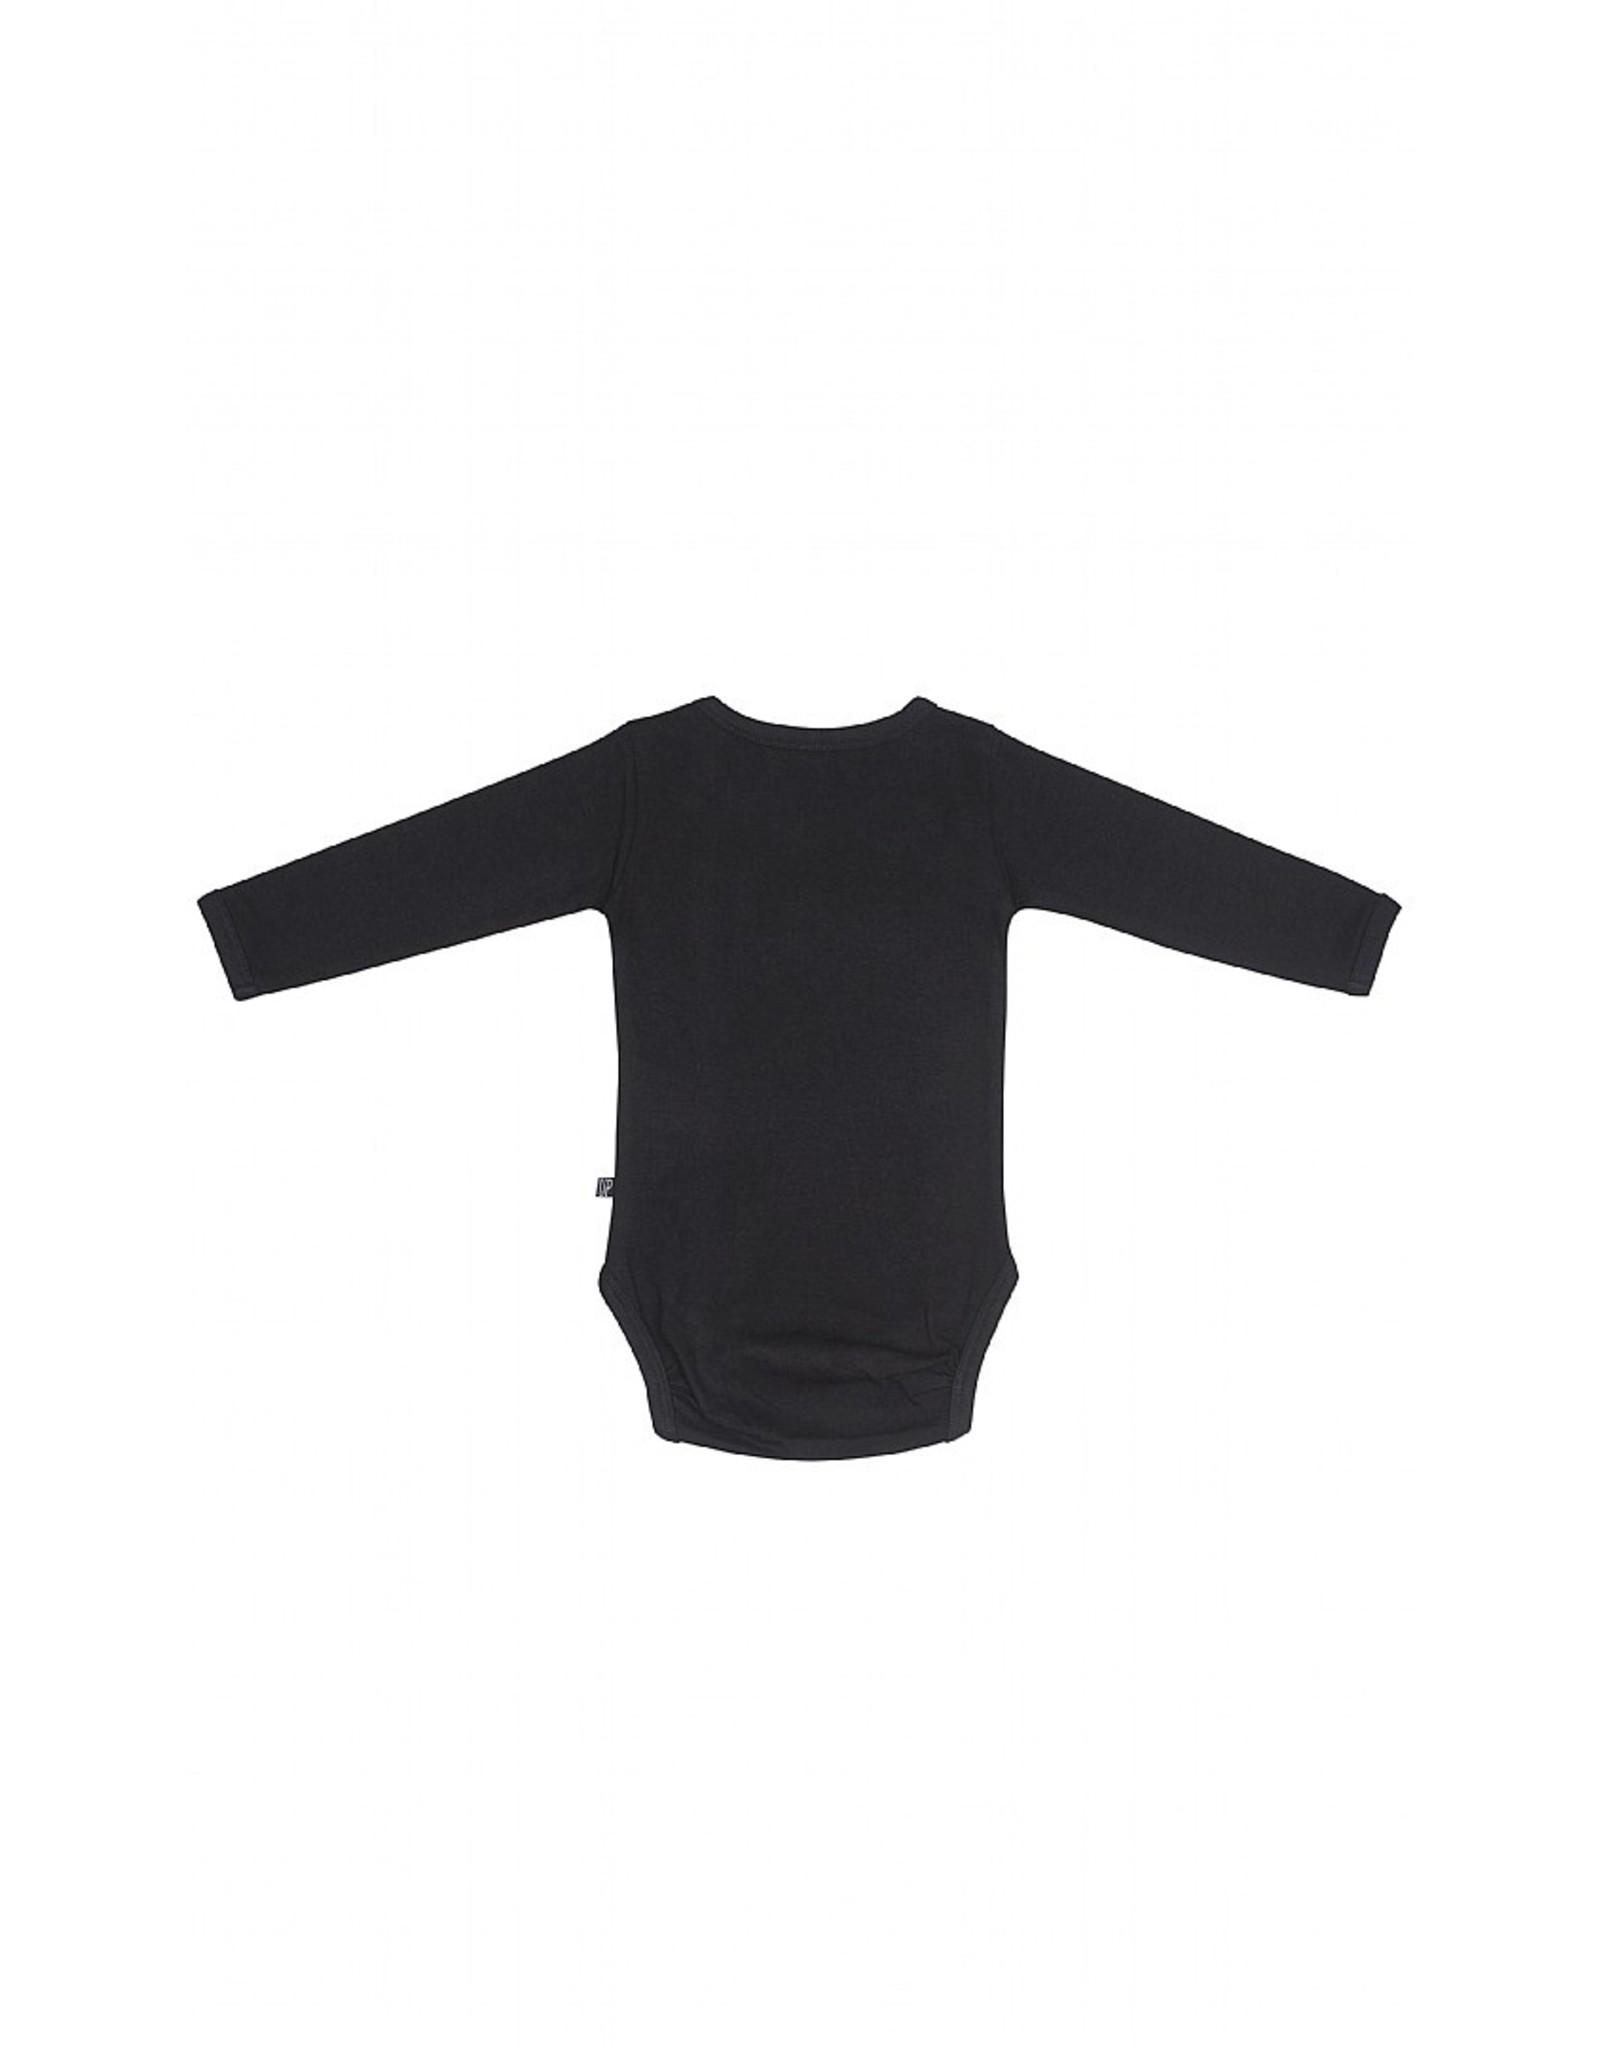 KIDS UP Kids Up Baby Body Black